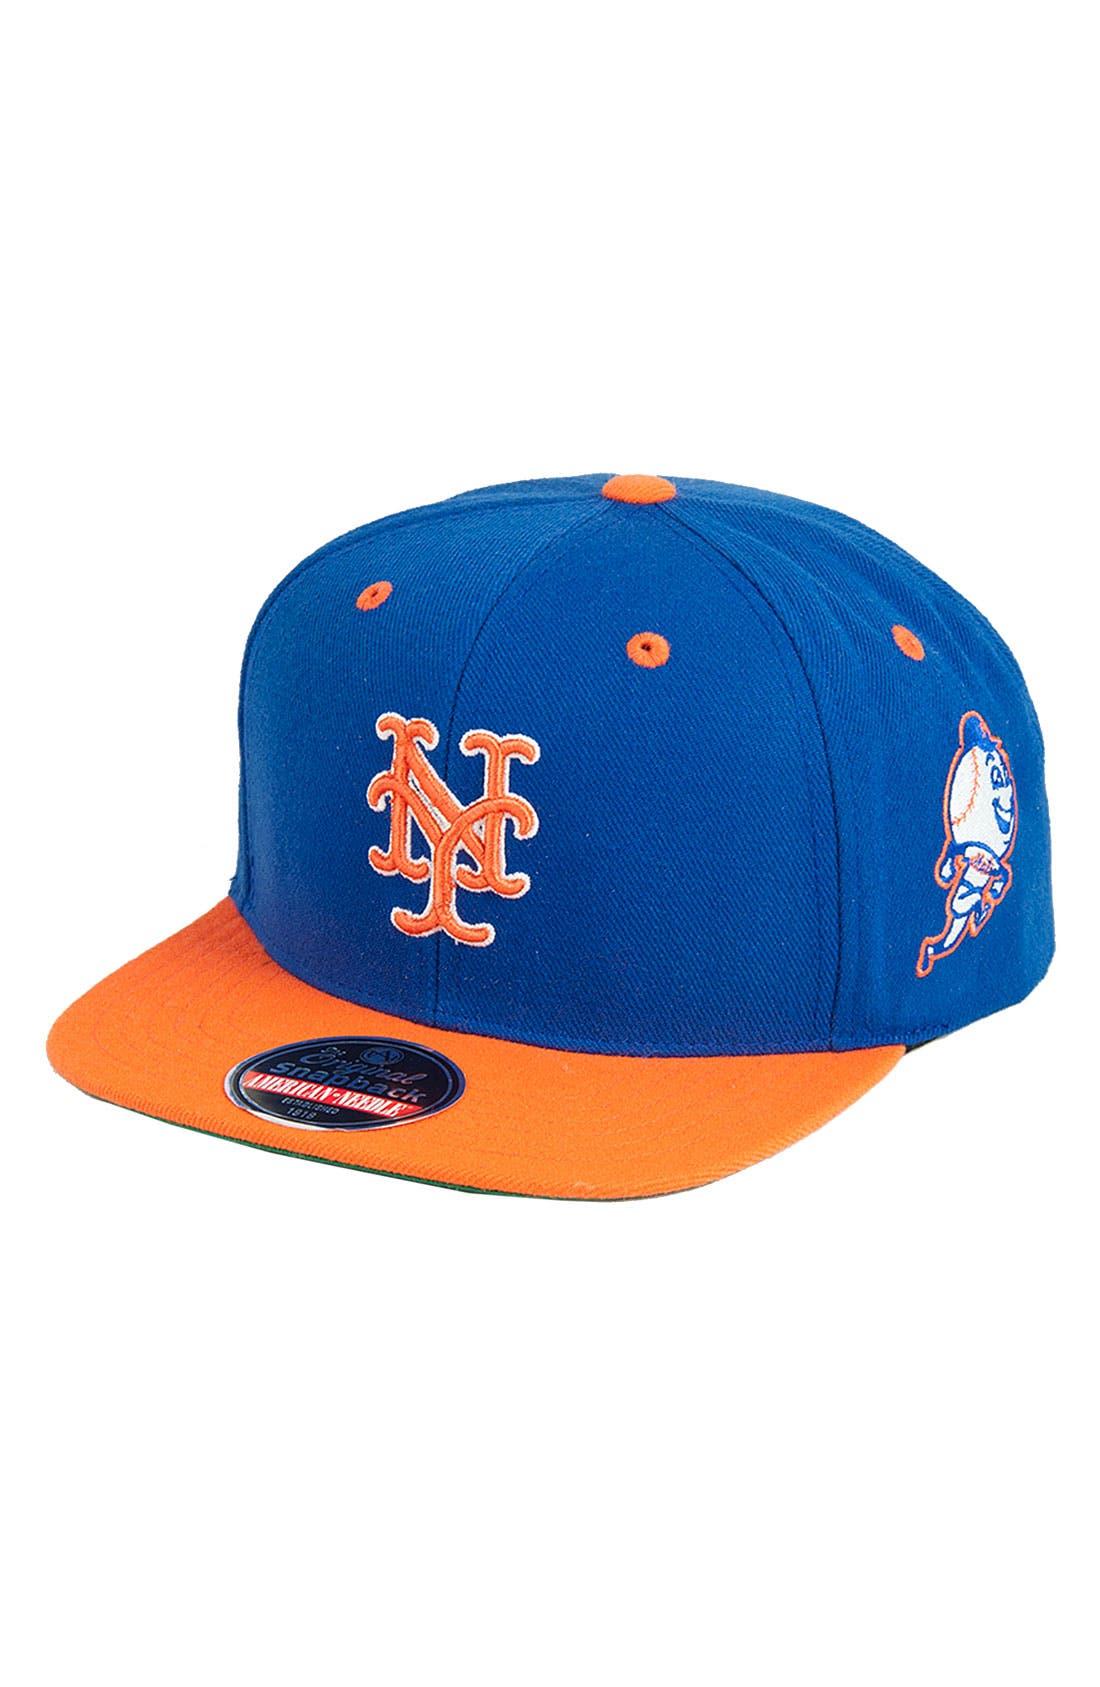 Alternate Image 1 Selected - American Needle 'Blockhead Mets' Snapback Baseball Cap